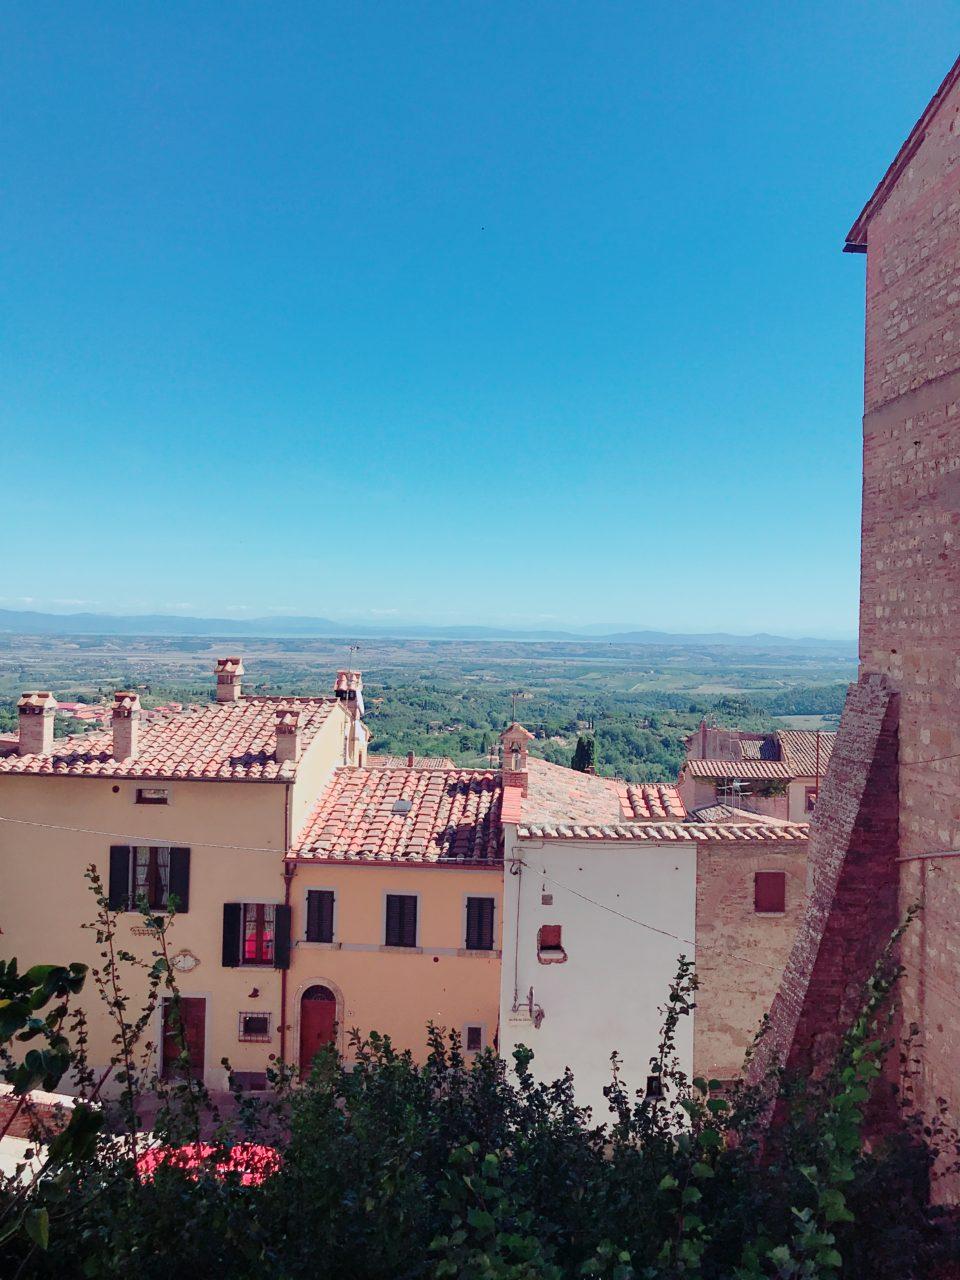 lifestyle redesign  - IMG 2171 960x1280 - Travel Tuesday: Exploring Tuscany - Montepulciano, Montalcino & Pienza